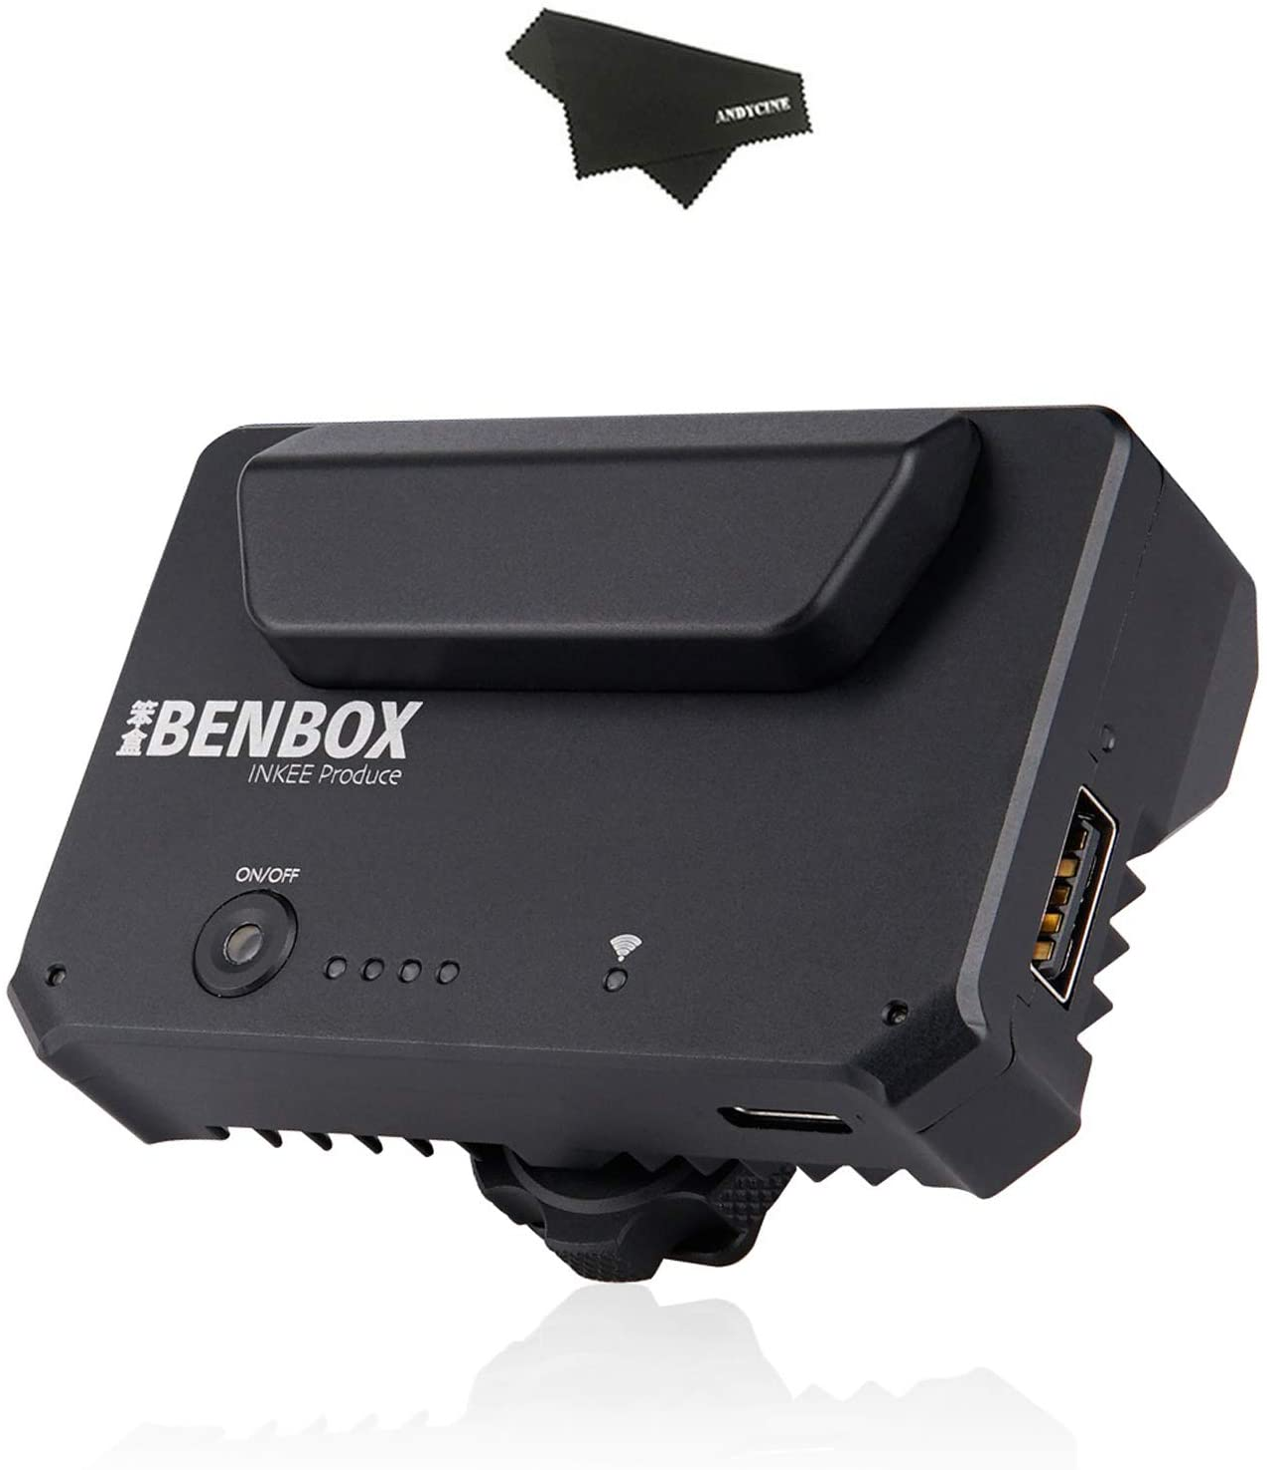 INKEE Benbox Wireless Video Transmitter Time sale 5.8G HDMI Popular popular 1080p Li WiFi